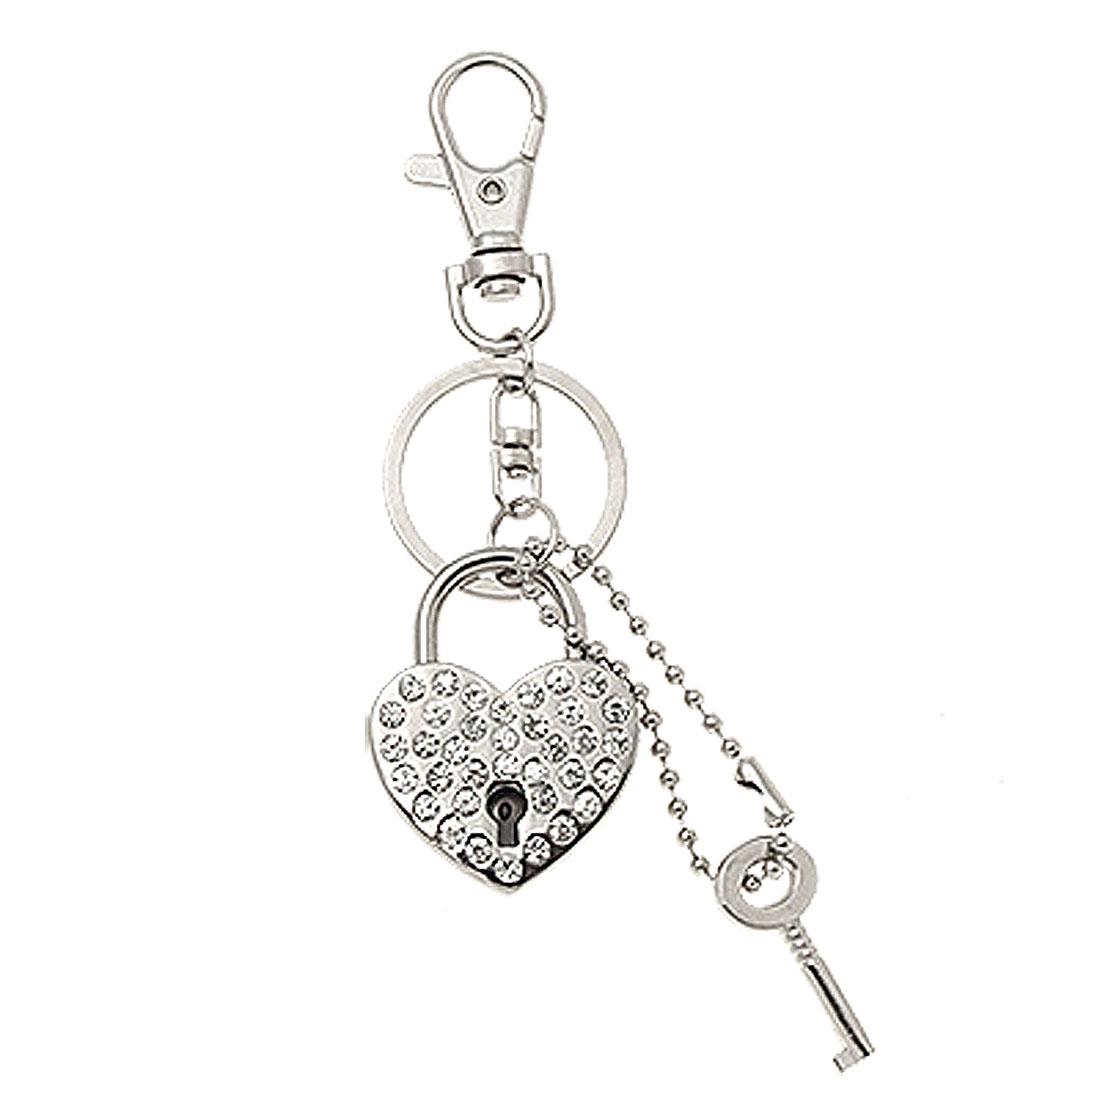 Silvery Rhinestone Heart Shape Lock & Key Keychain Keyring Handbag Purse Charm